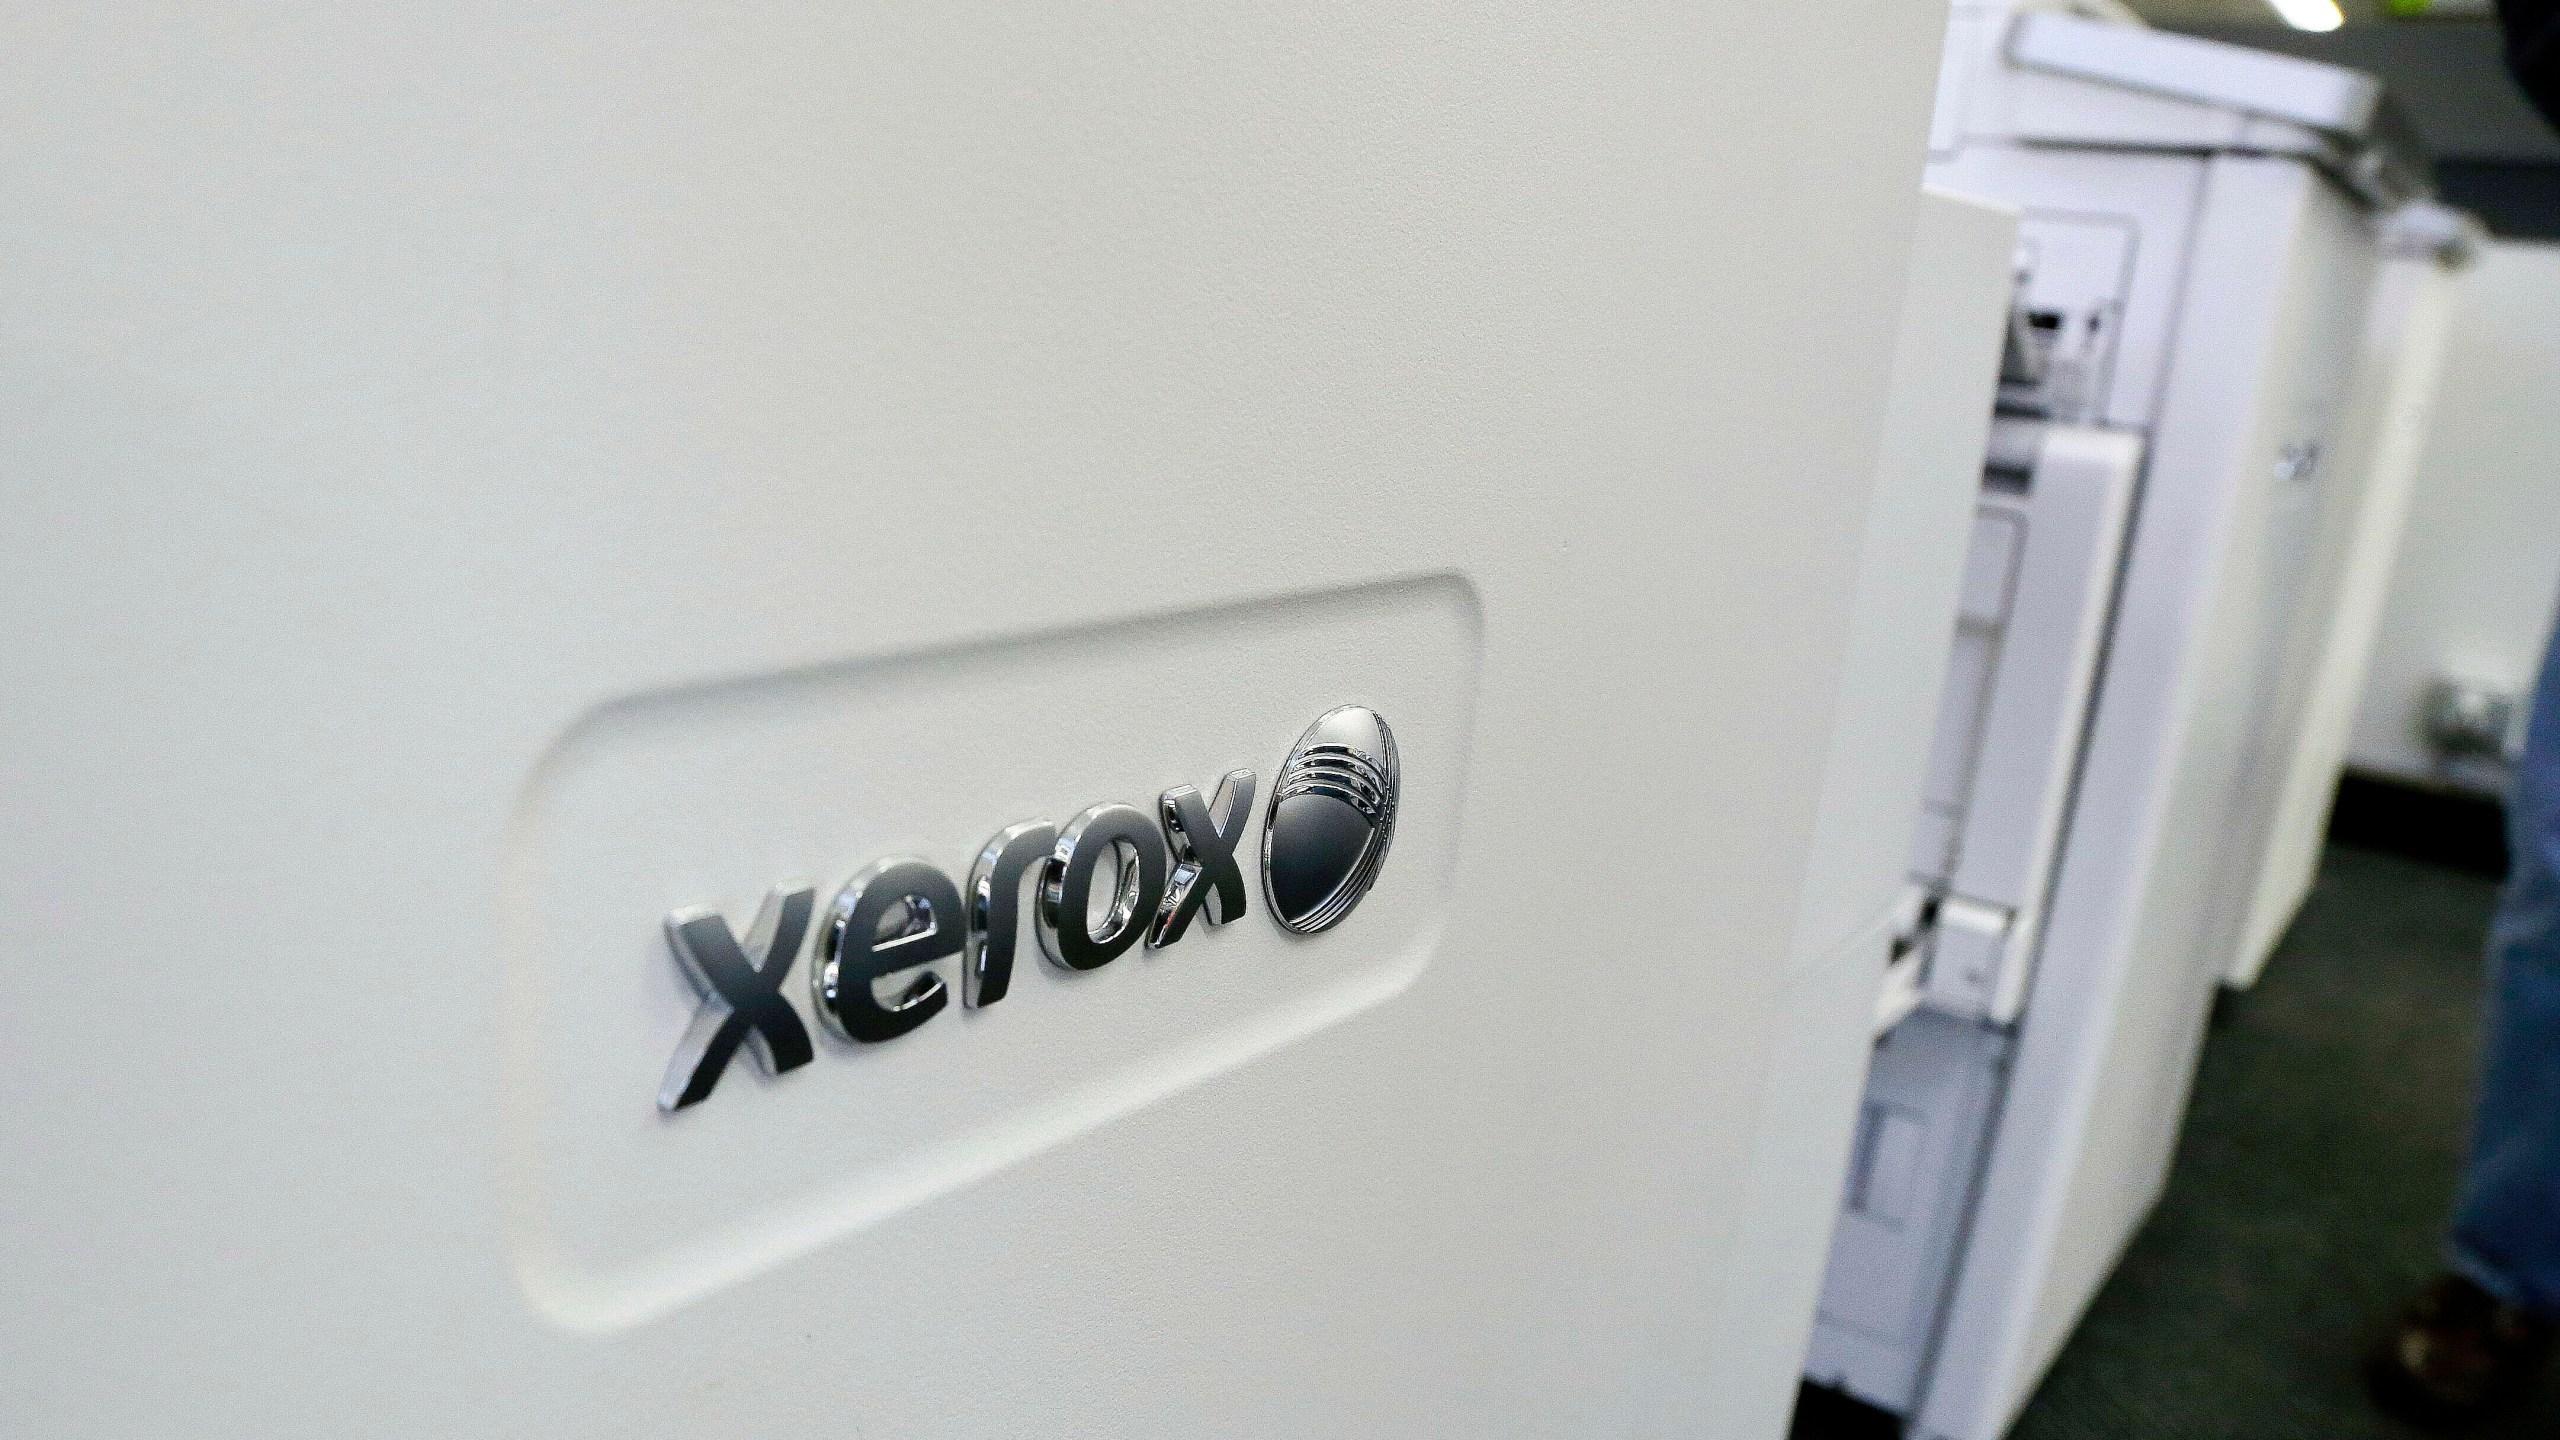 Xerox_Holding_Company_81306-159532.jpg21437891